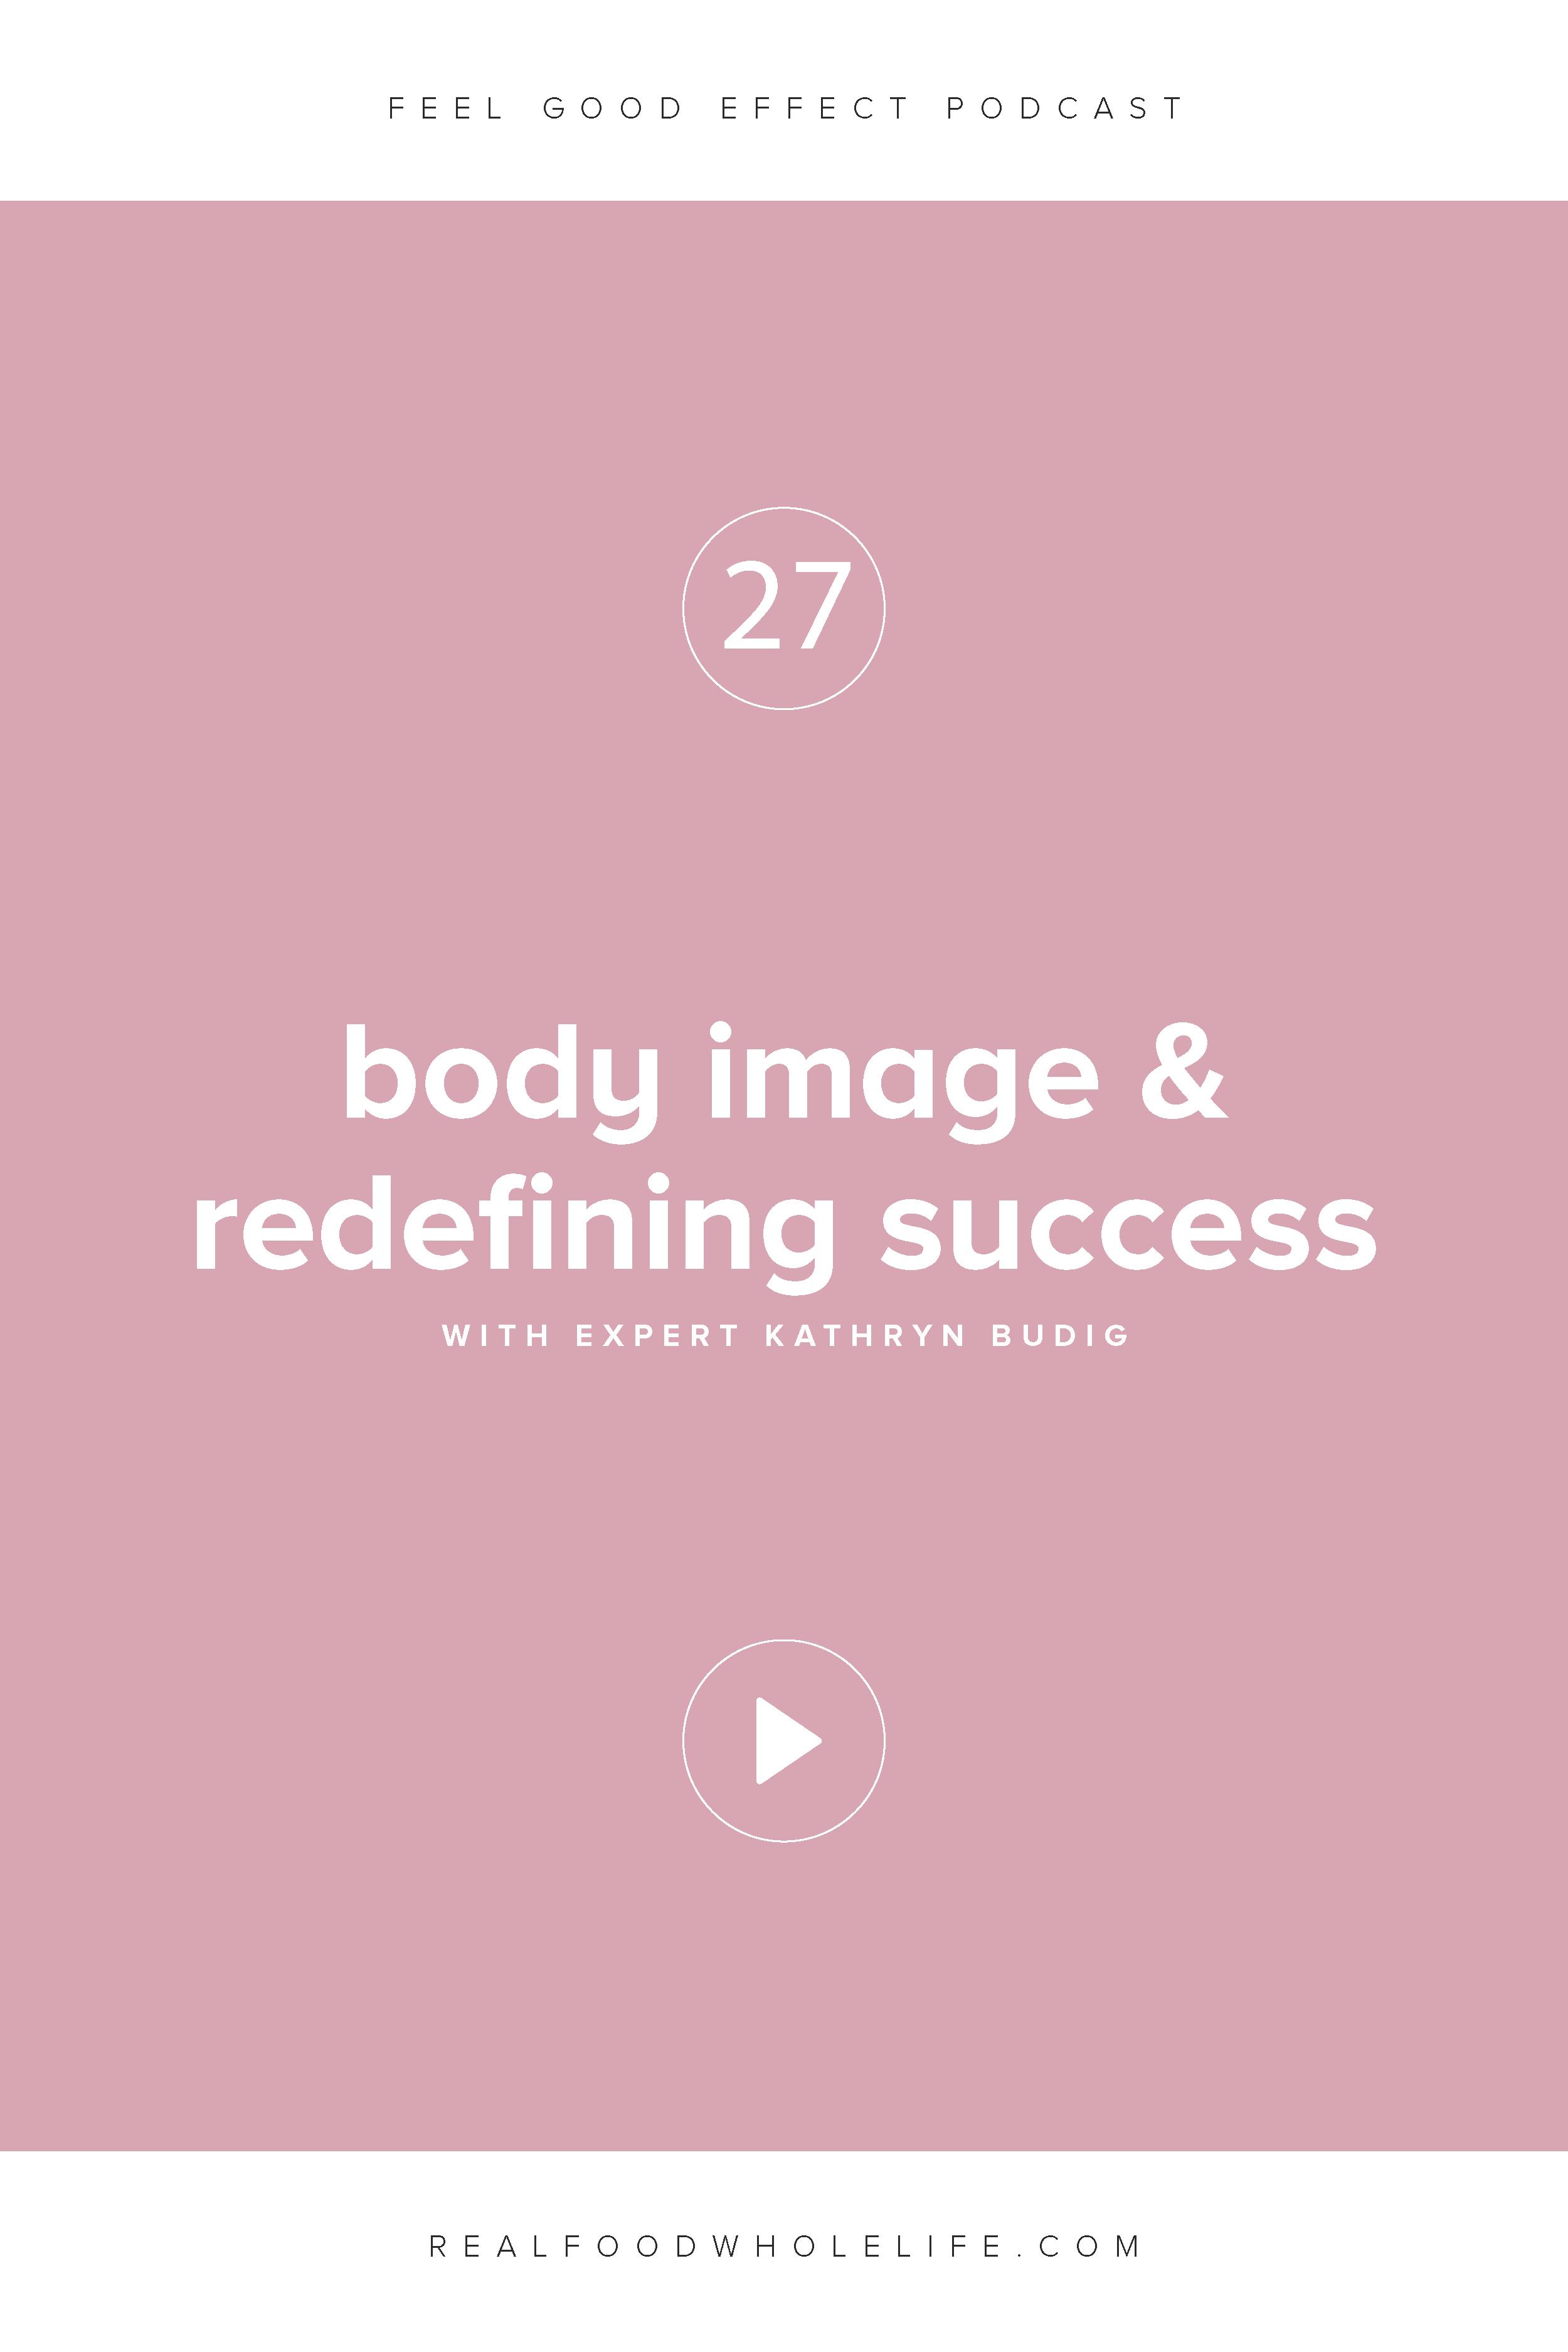 Kathryn Budig on Body Image & Redefining Success